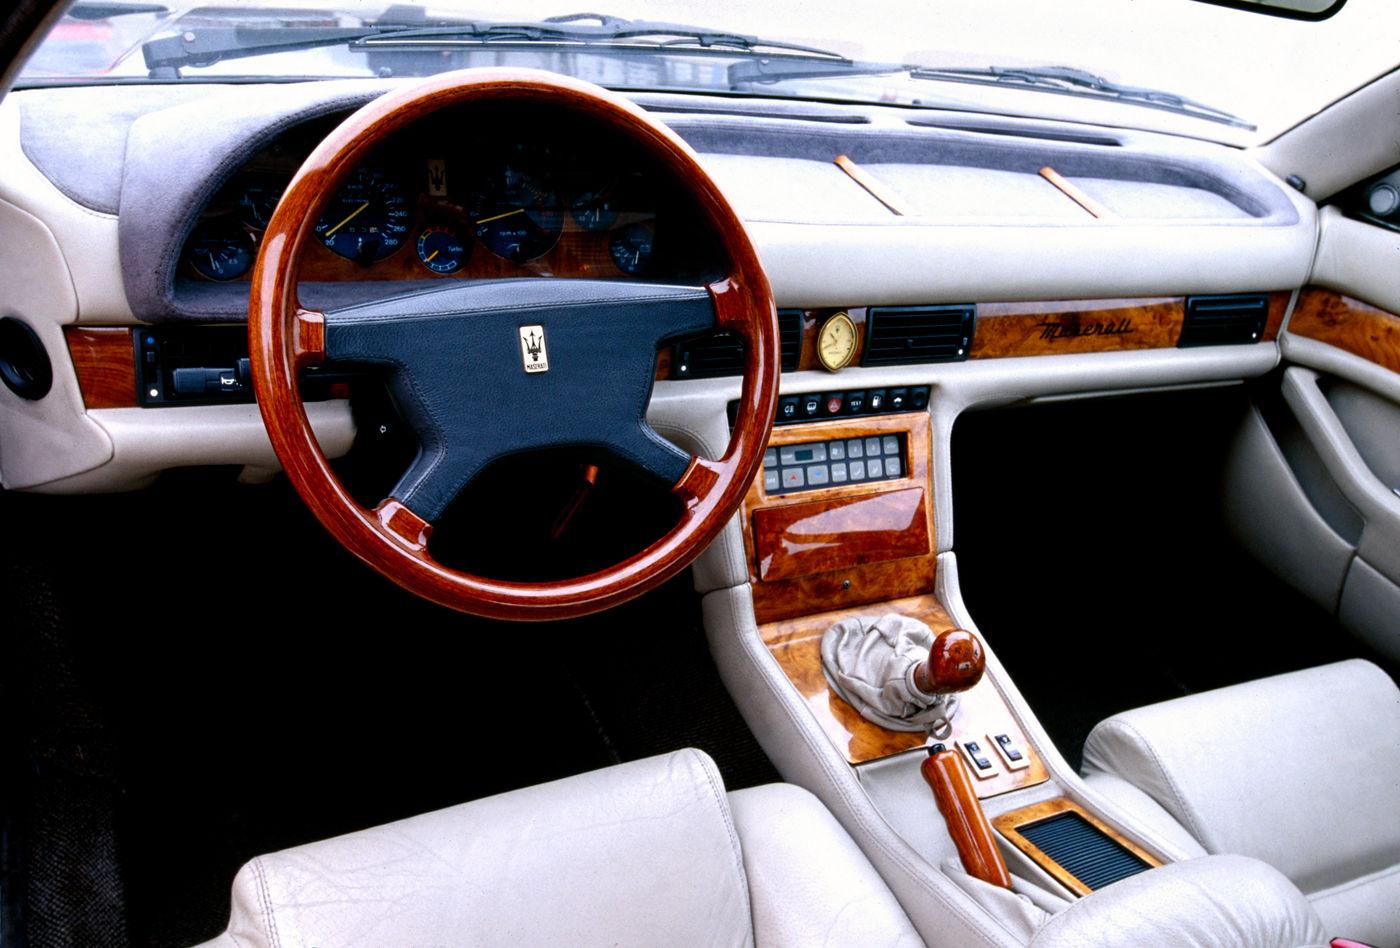 1989 Maserati Karif - Biturbo - interior of the classic car model